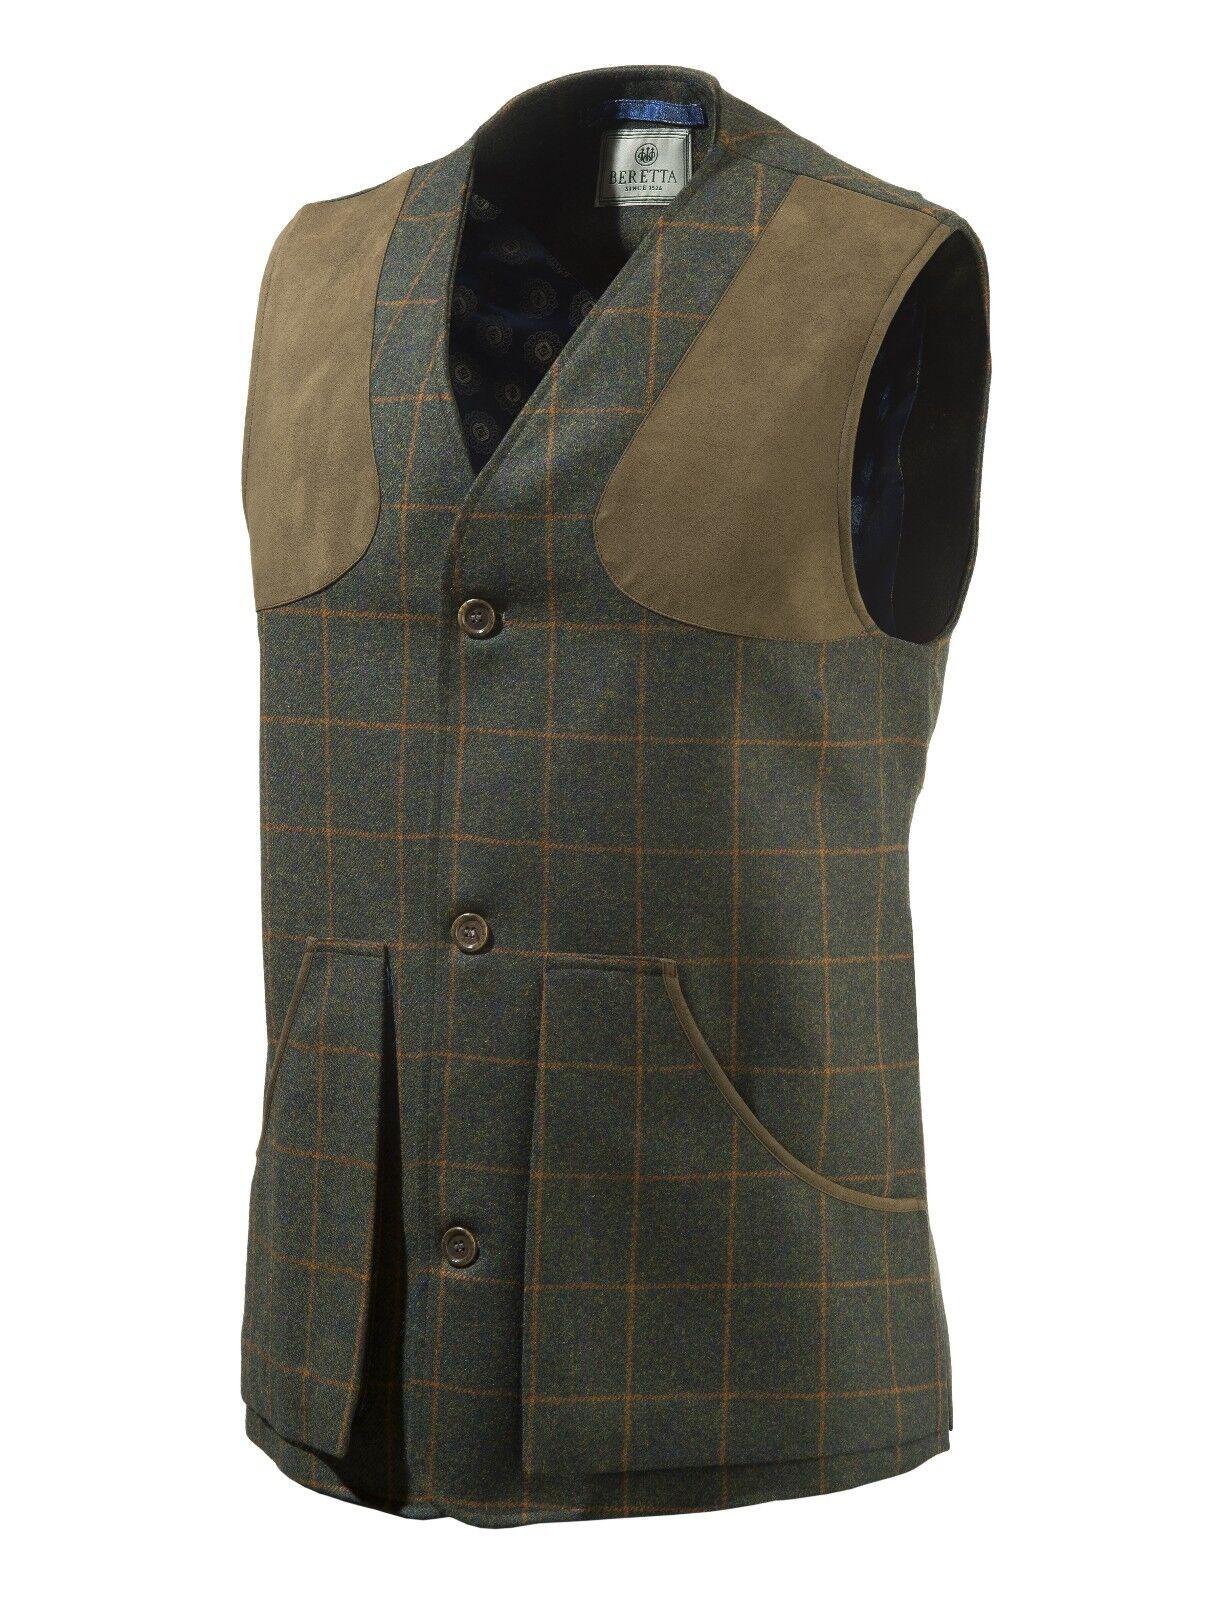 Beretta ST James Technical Tweed Shooting Vest